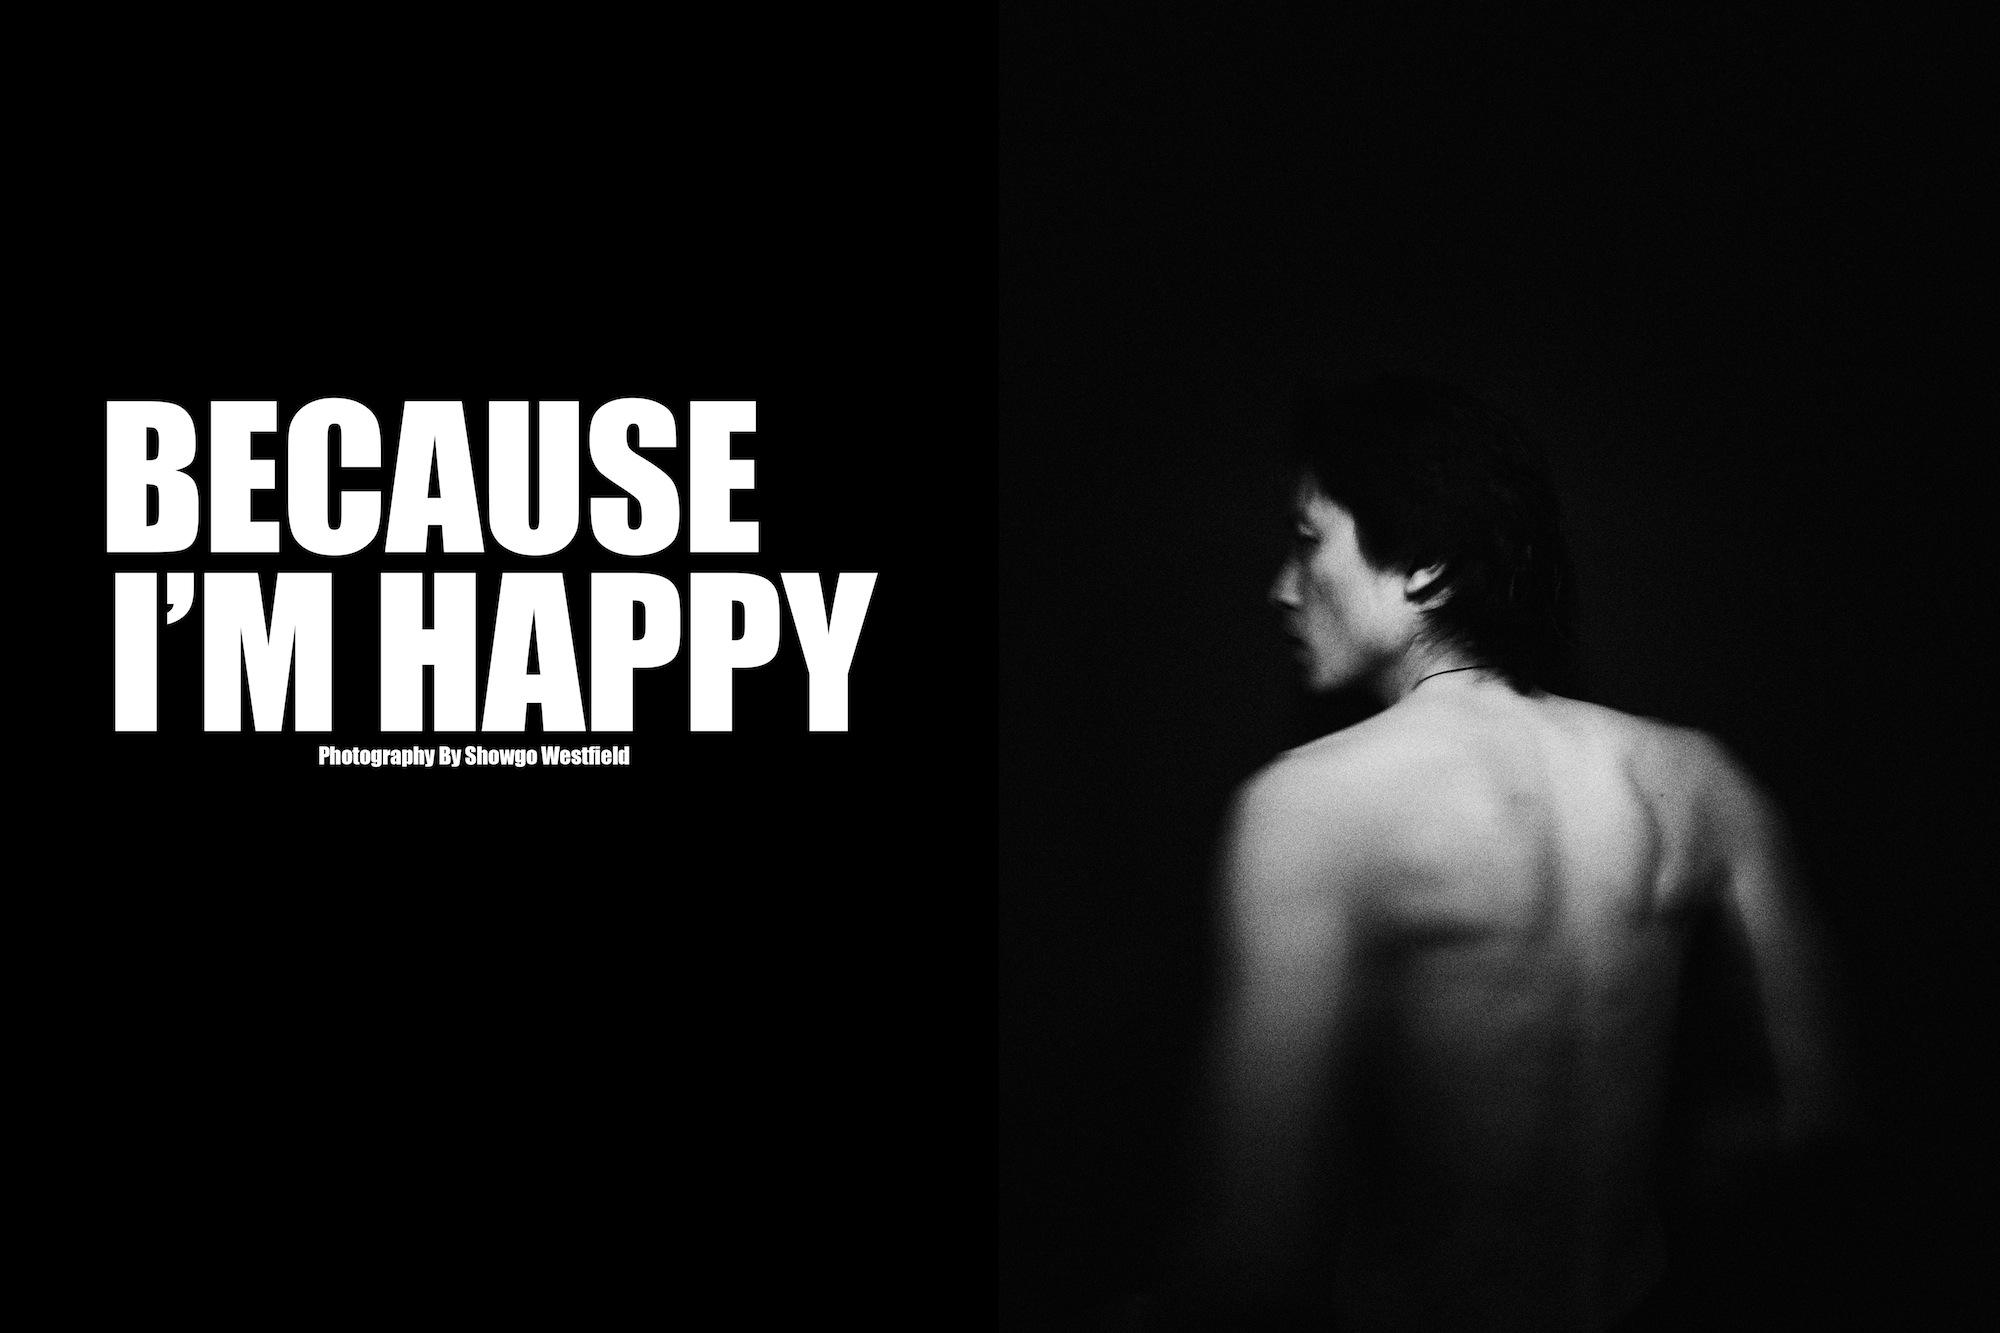 because i am happy